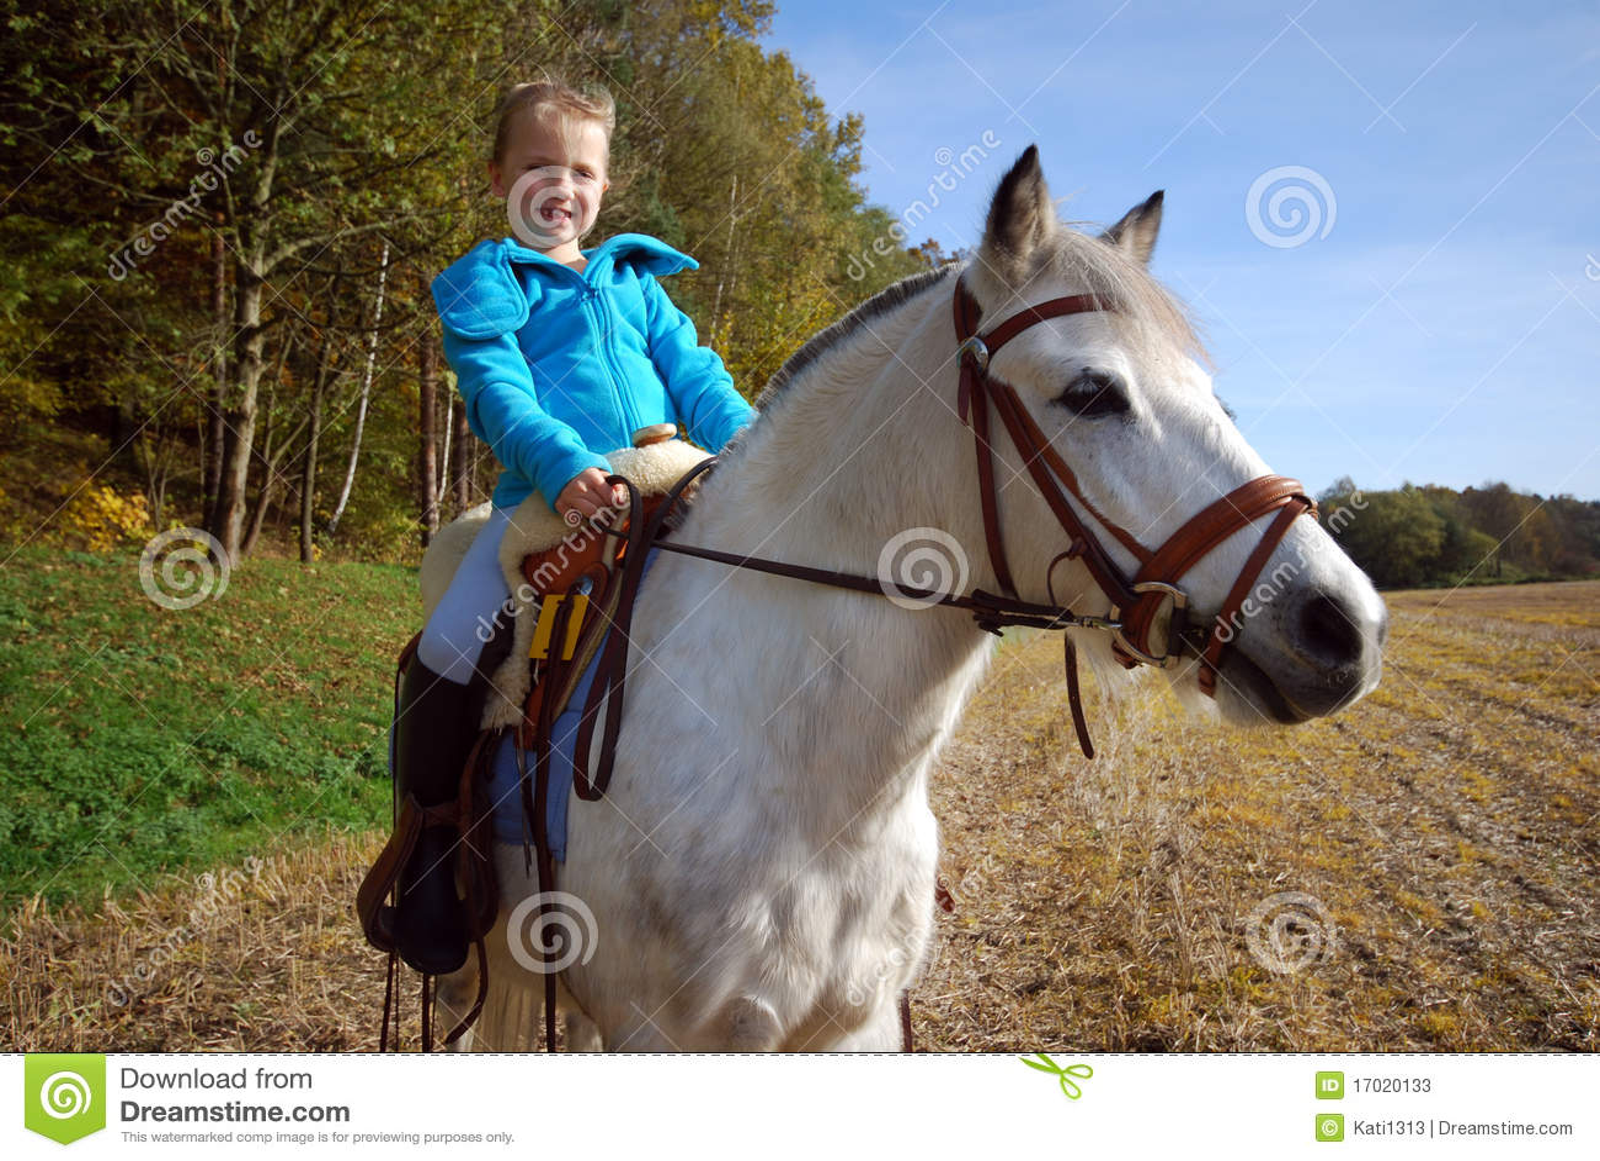 little girl anal ride